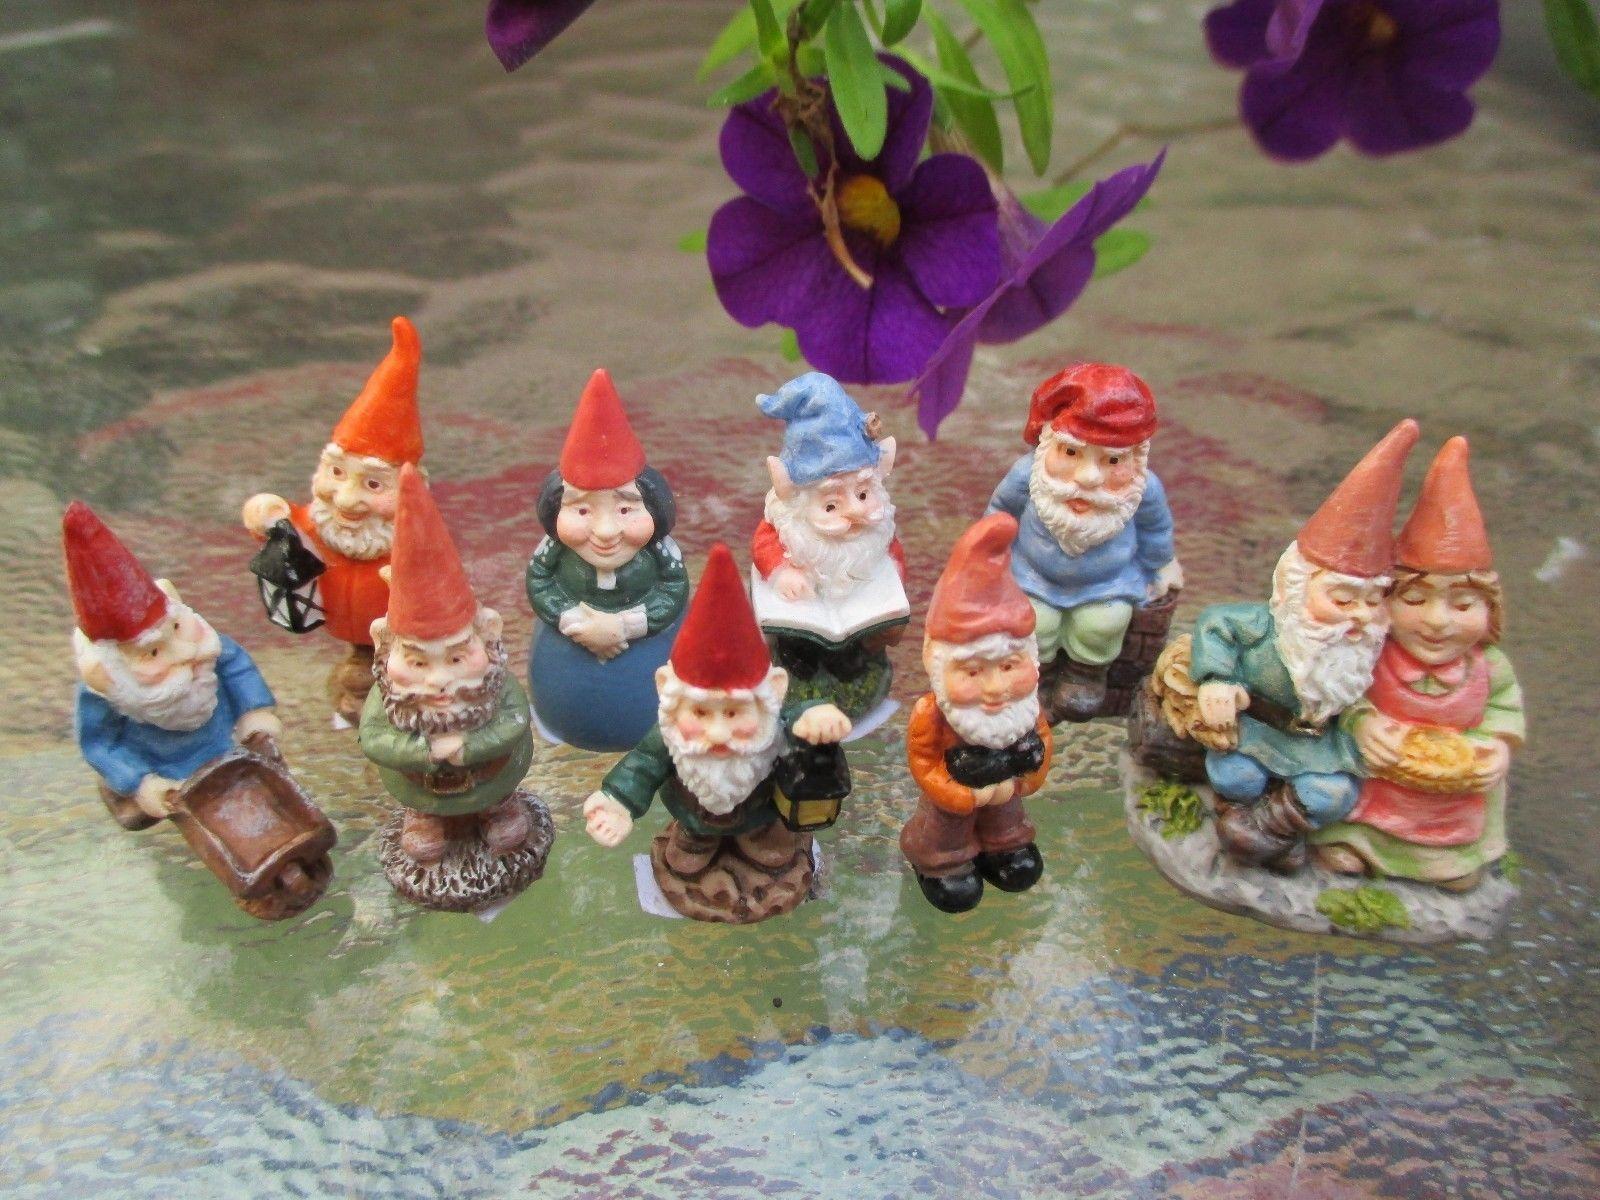 Dollhouse Miniatures Terrific Assortment Of Little Tiny Garden Gnomes 9 PC